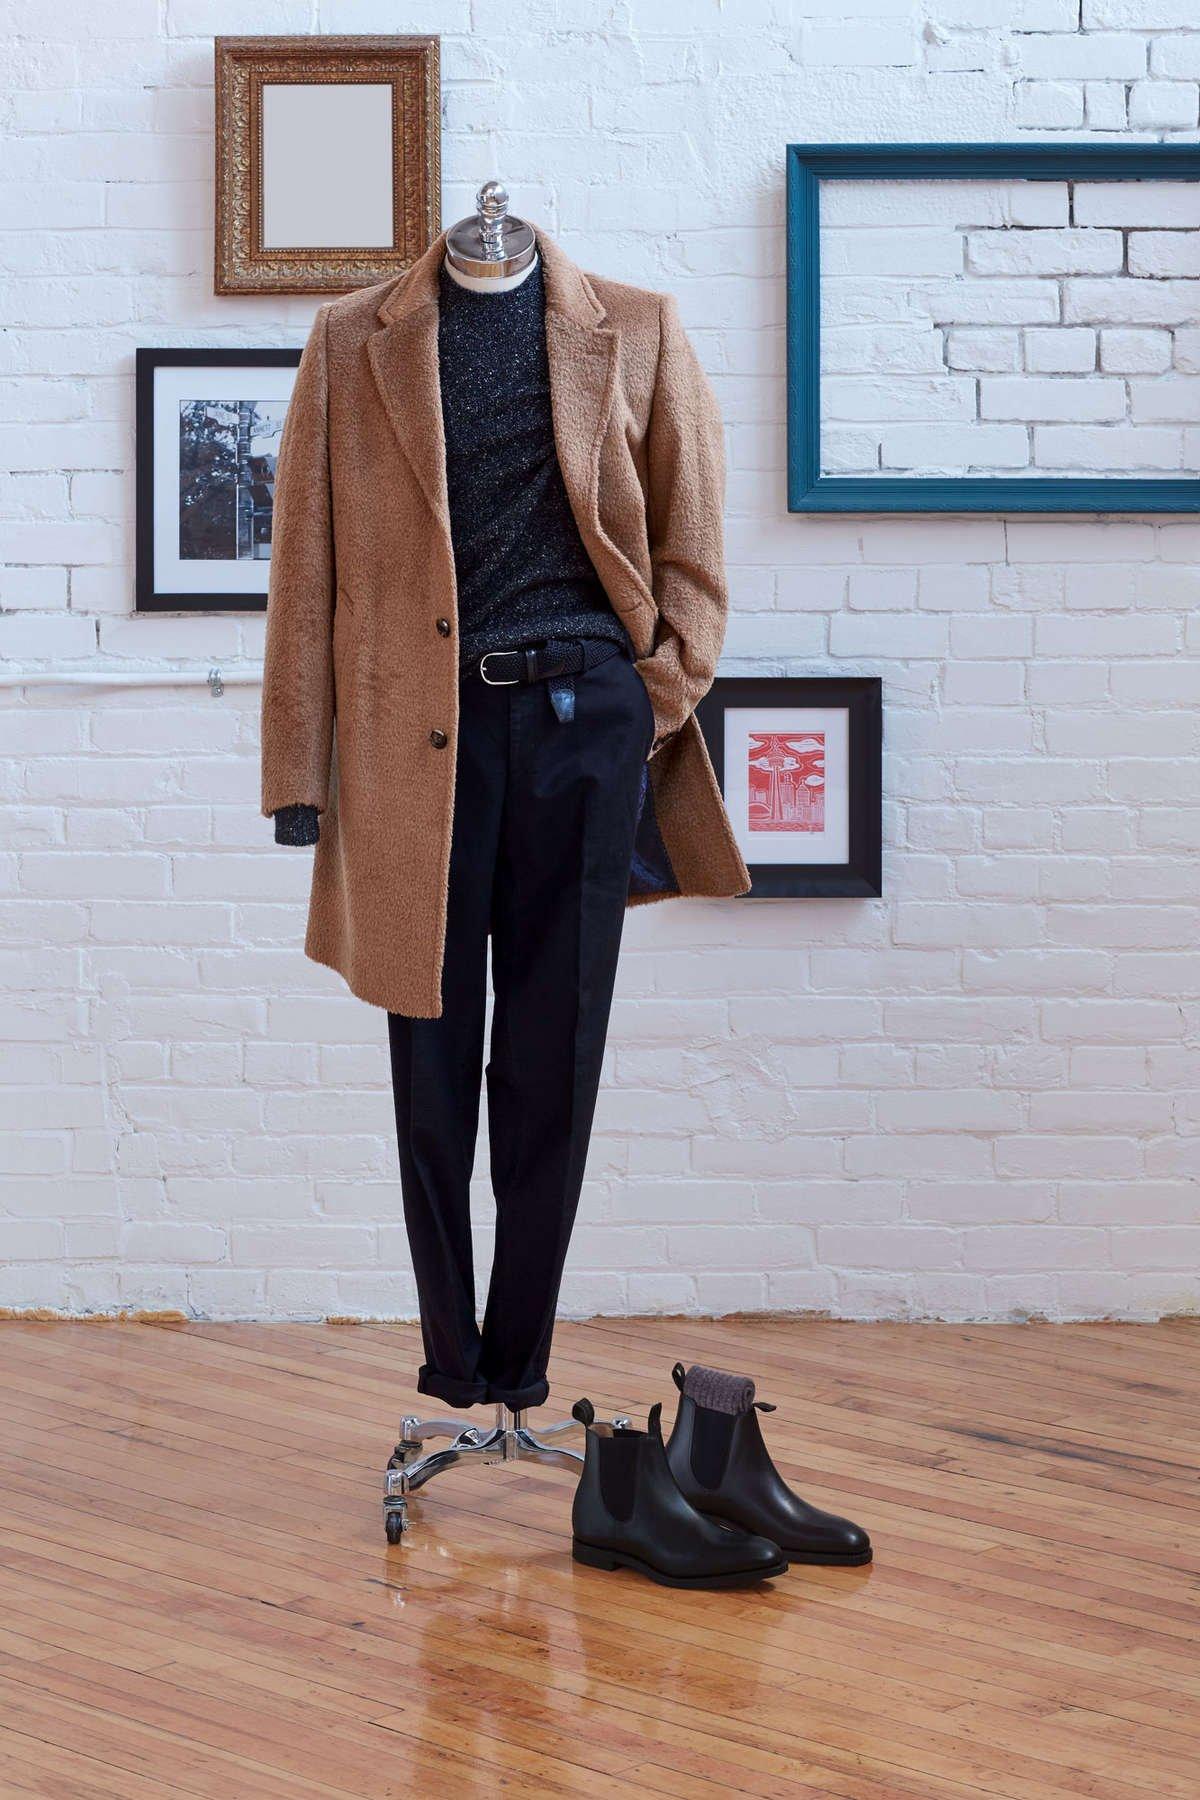 The Artist - Lalonde's Boutique